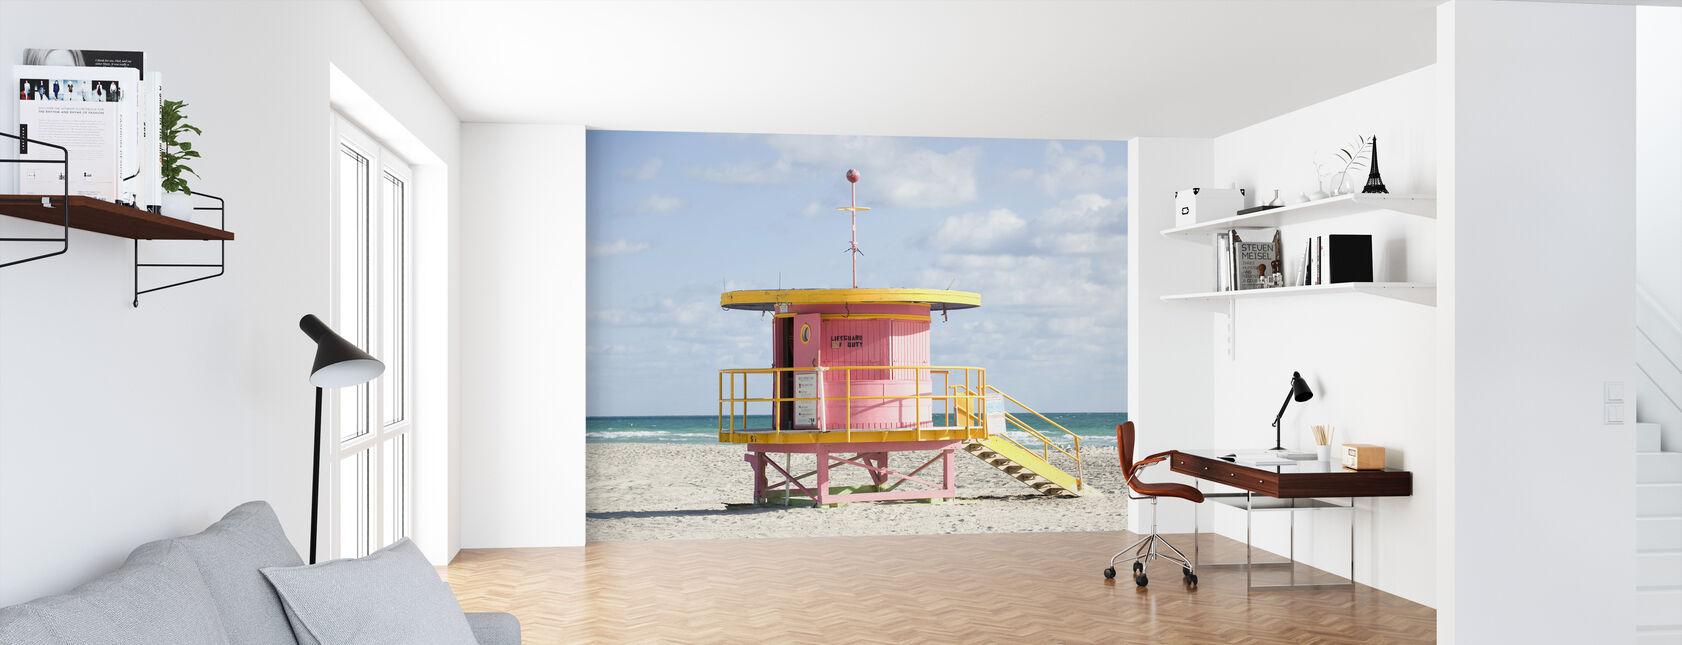 Rettungsschwimmer Tower in Miami, USA - Tapete - Büro